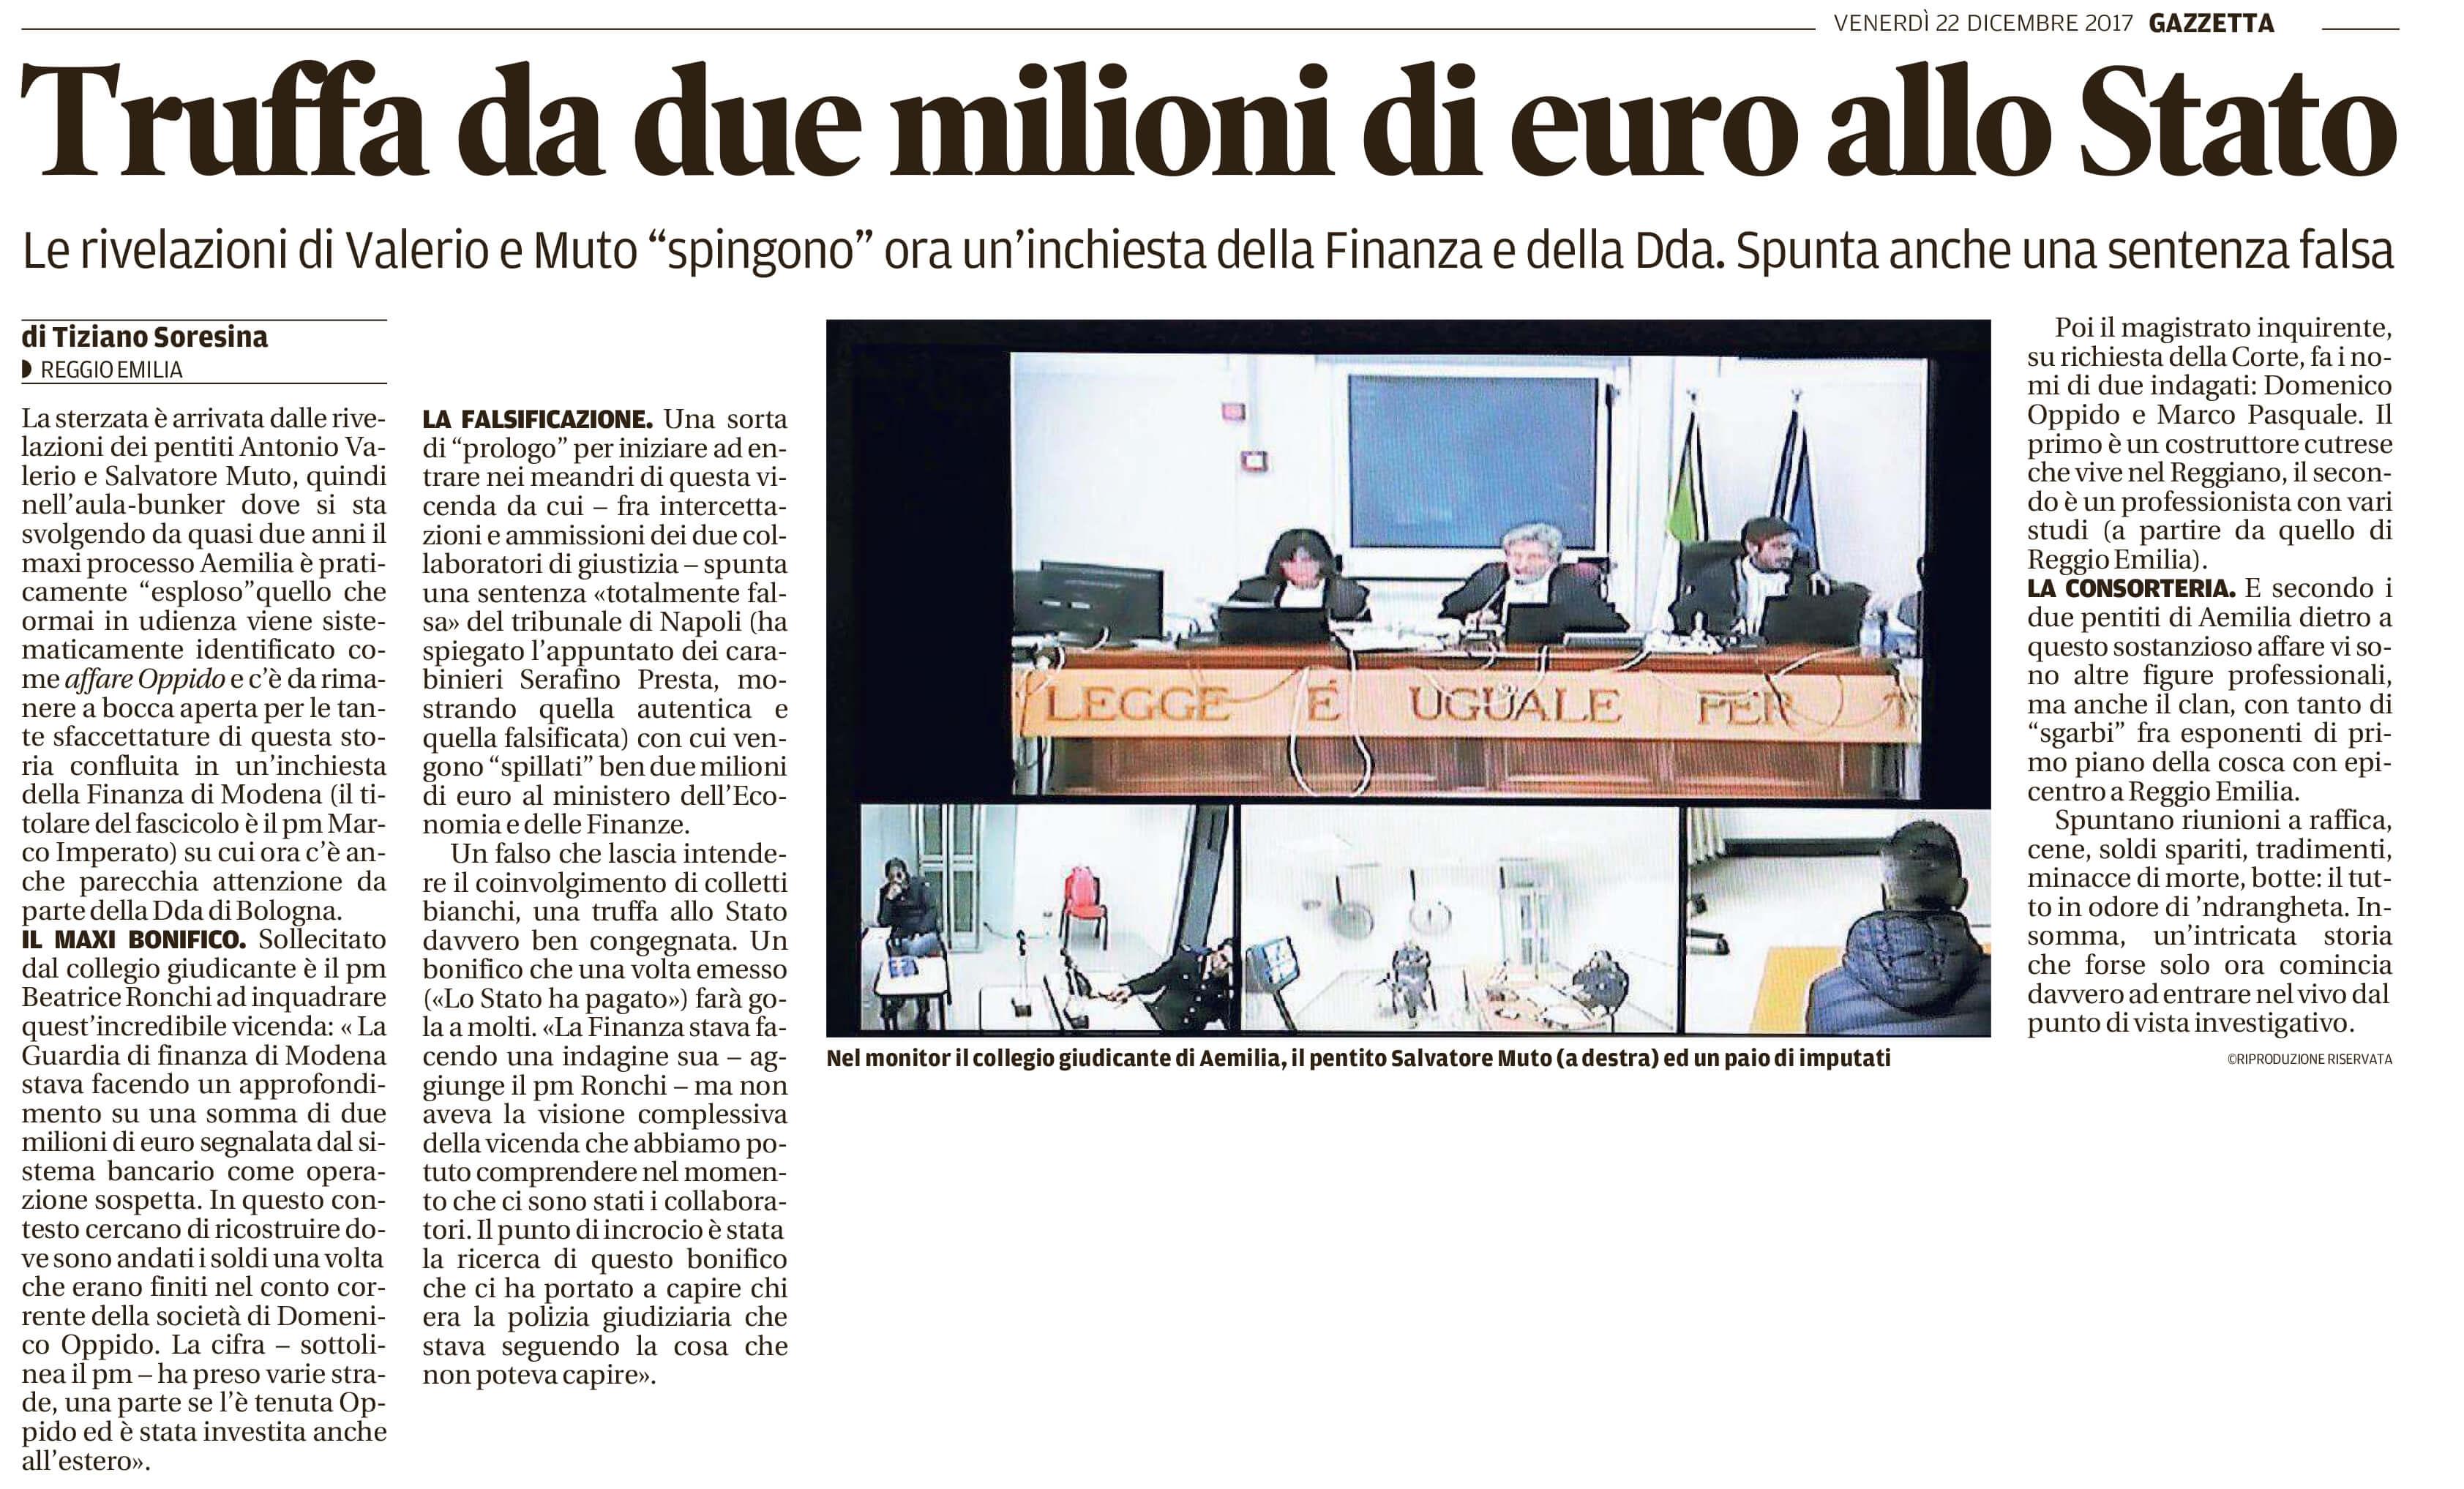 Truffa da due milioni di euro